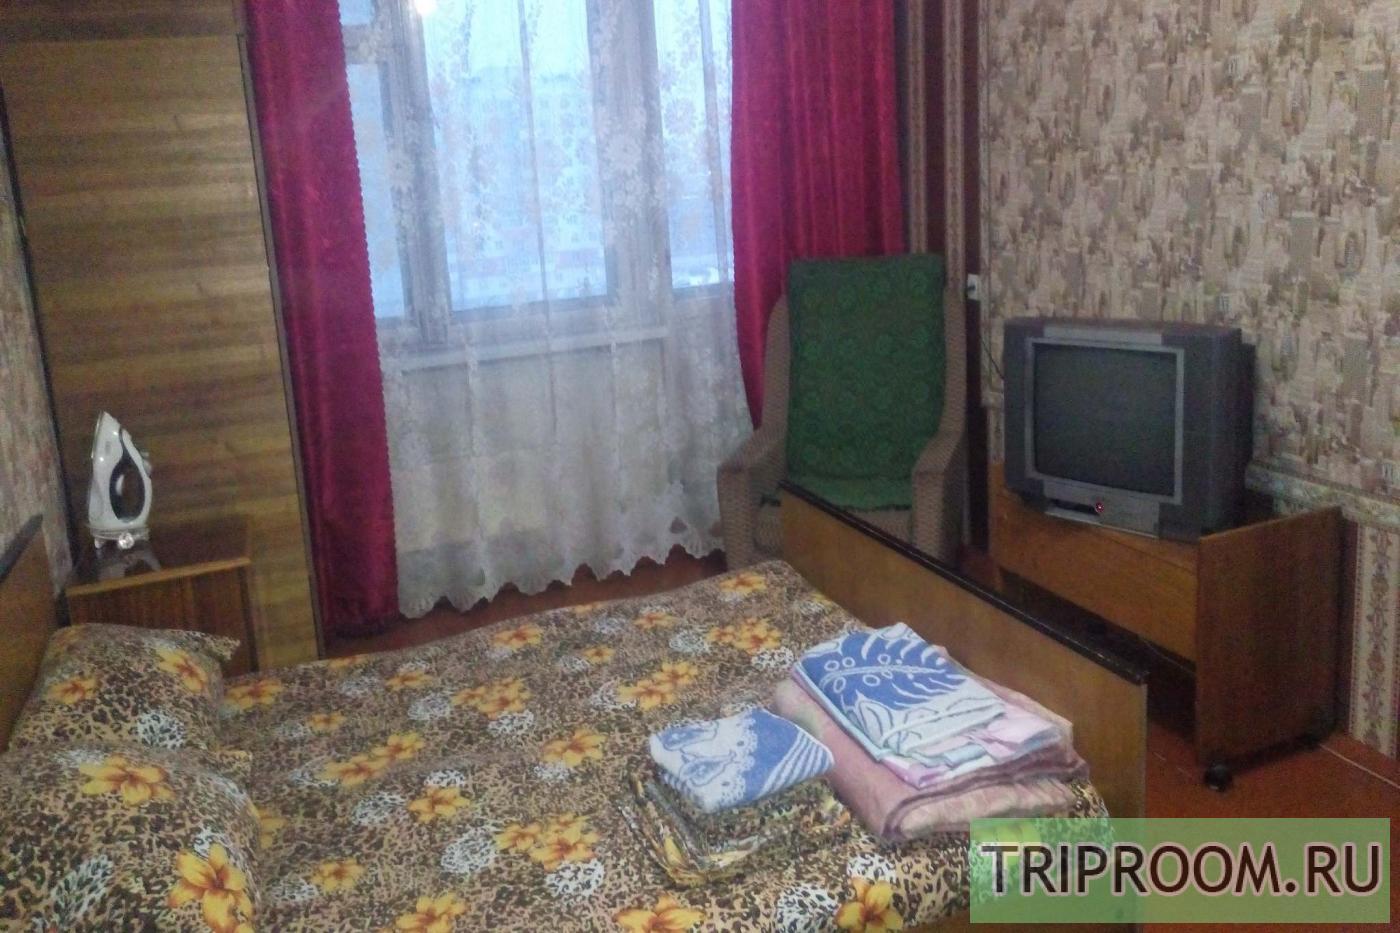 1-комнатная квартира посуточно (вариант № 5357), ул. Строителей улица, фото № 2